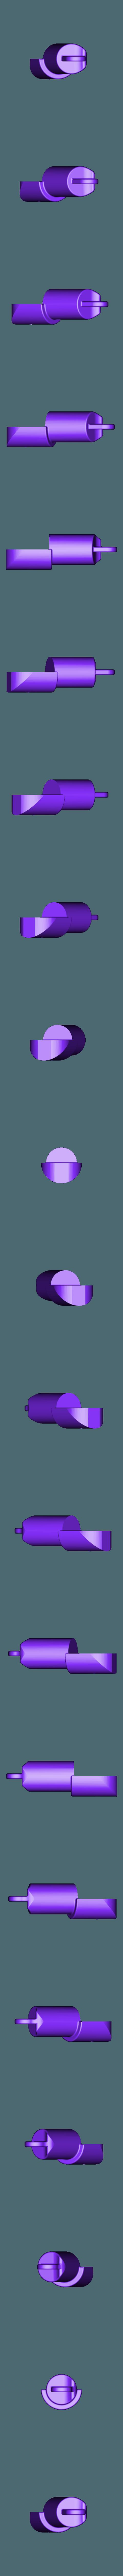 Leg_Top_LH.STL Download free STL file Automata-4 Ben rides around the clock • 3D printer template, woodenclocks